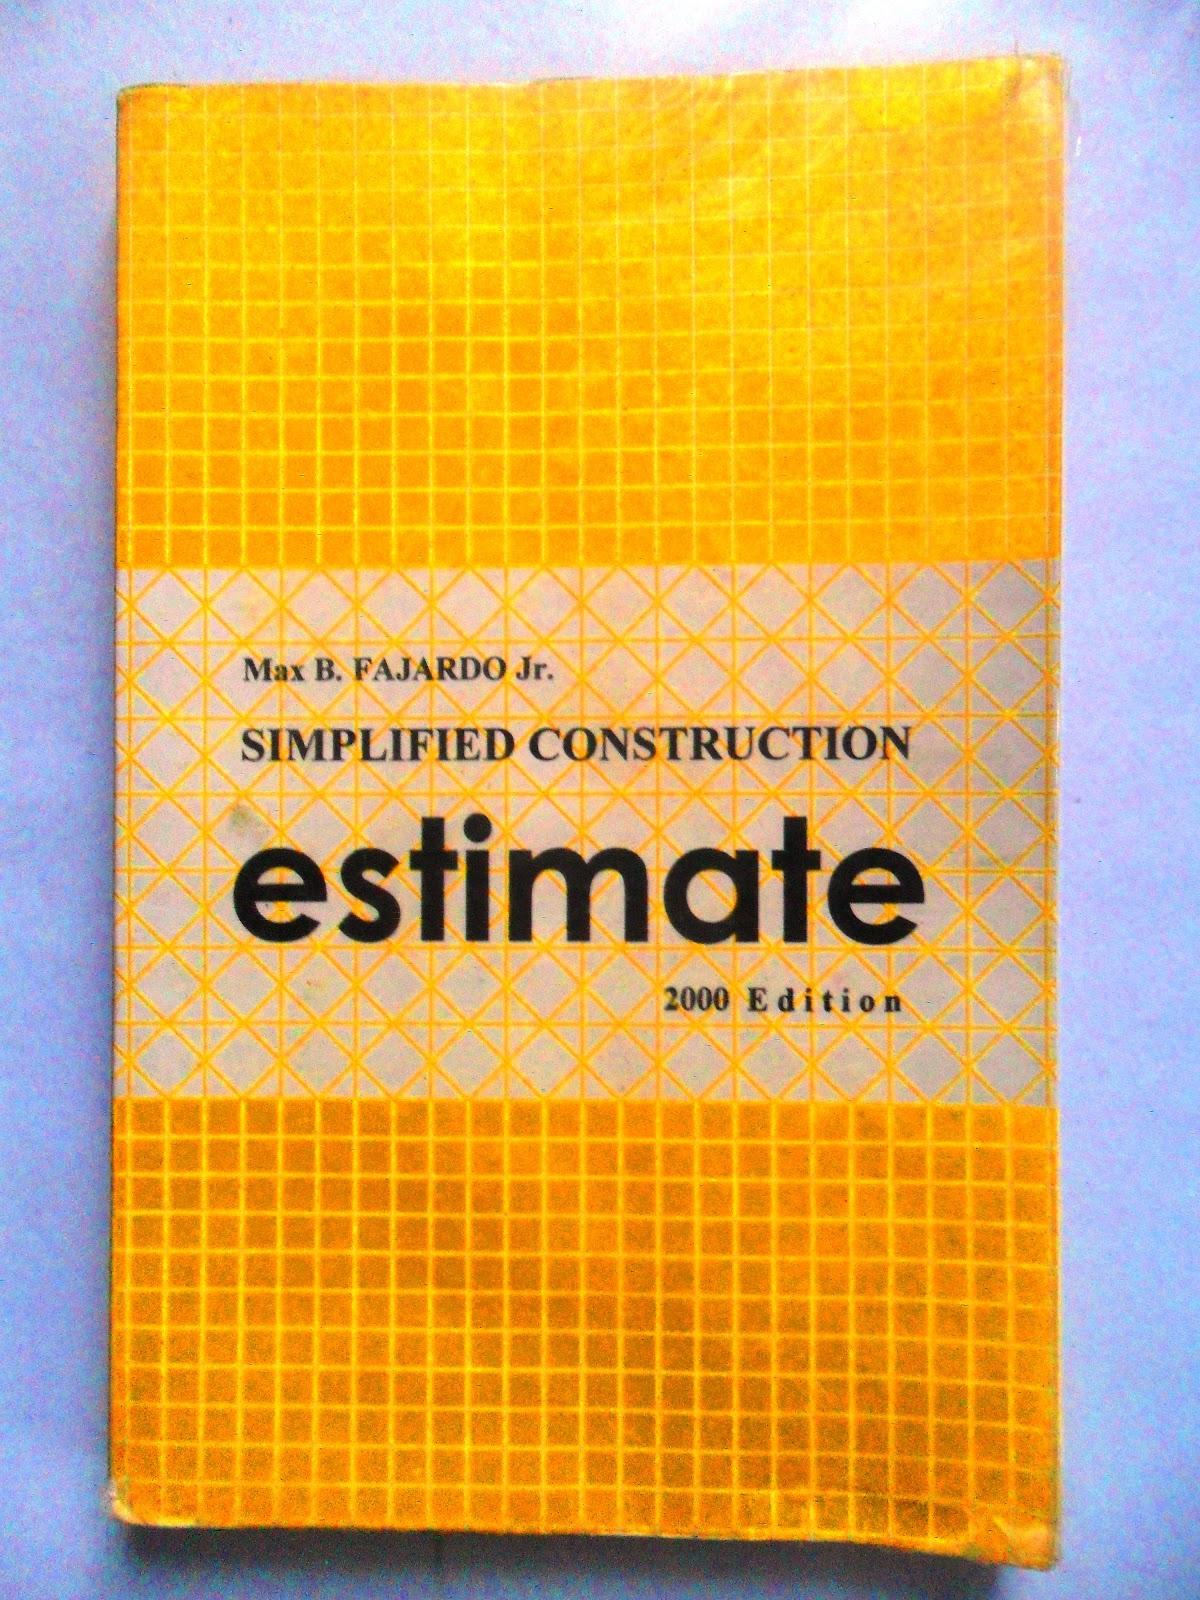 Construction Estimates By Max Fajardo Pdf